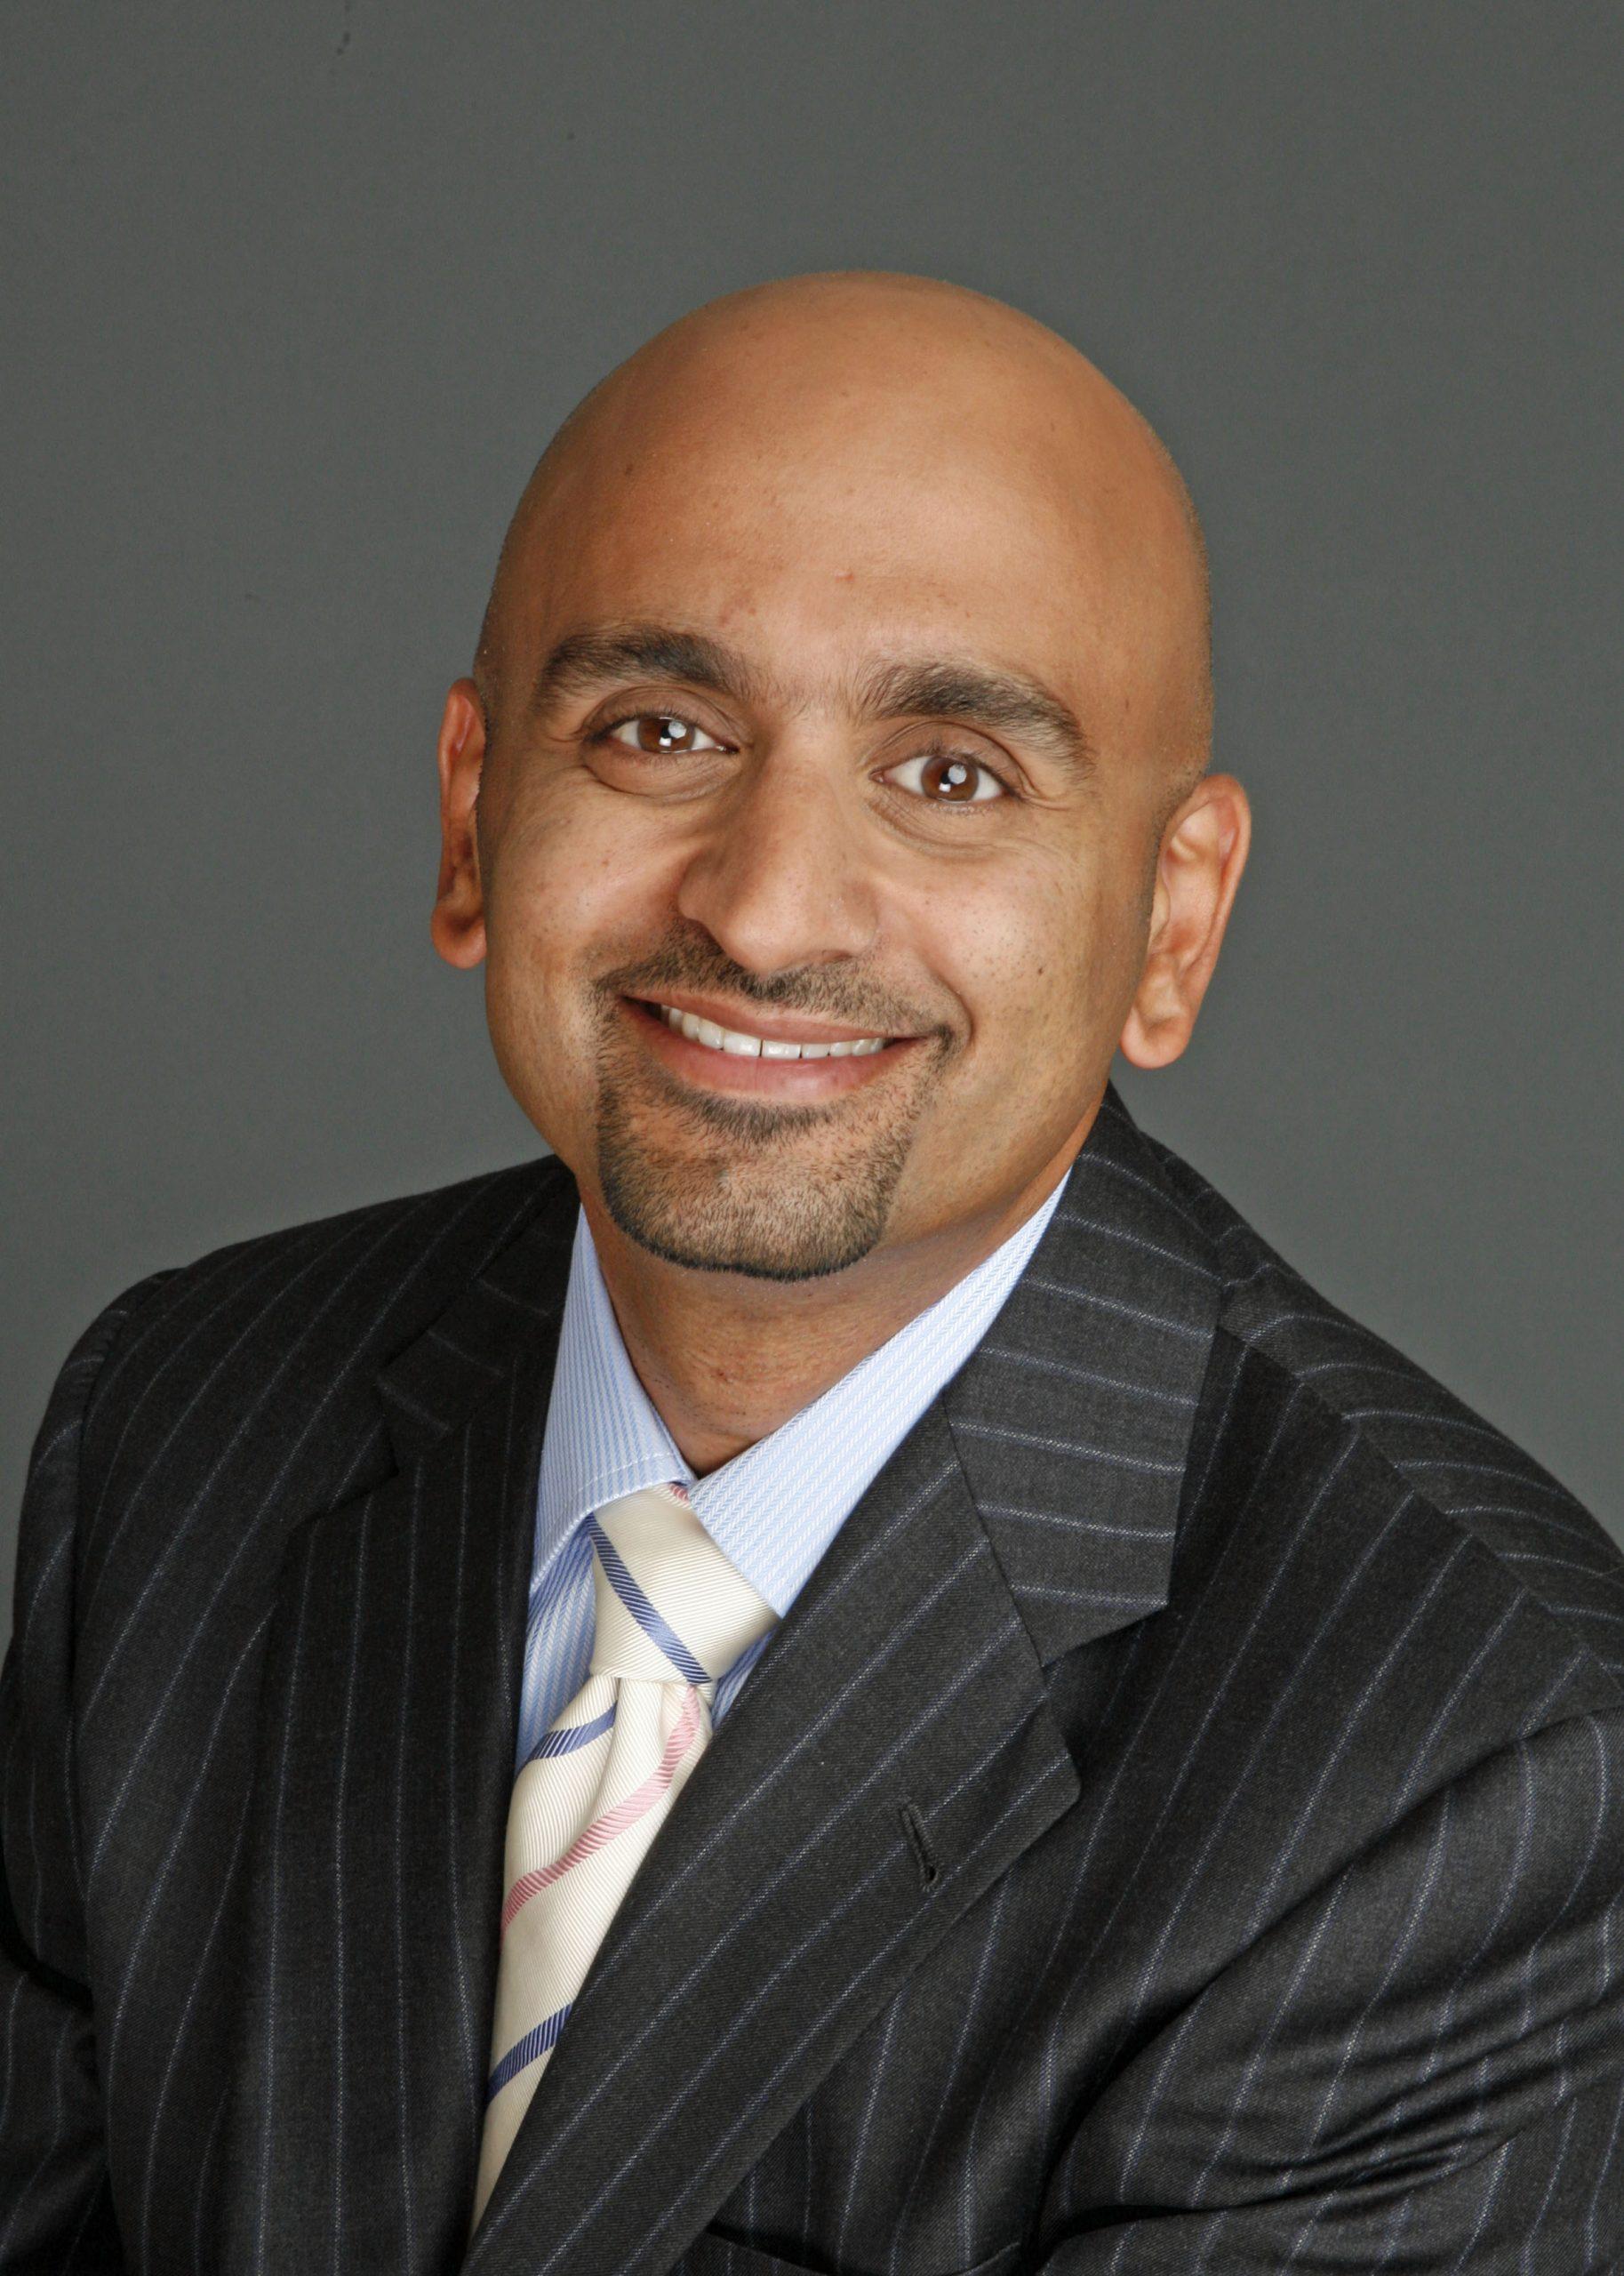 Ishu V. Rao, MD